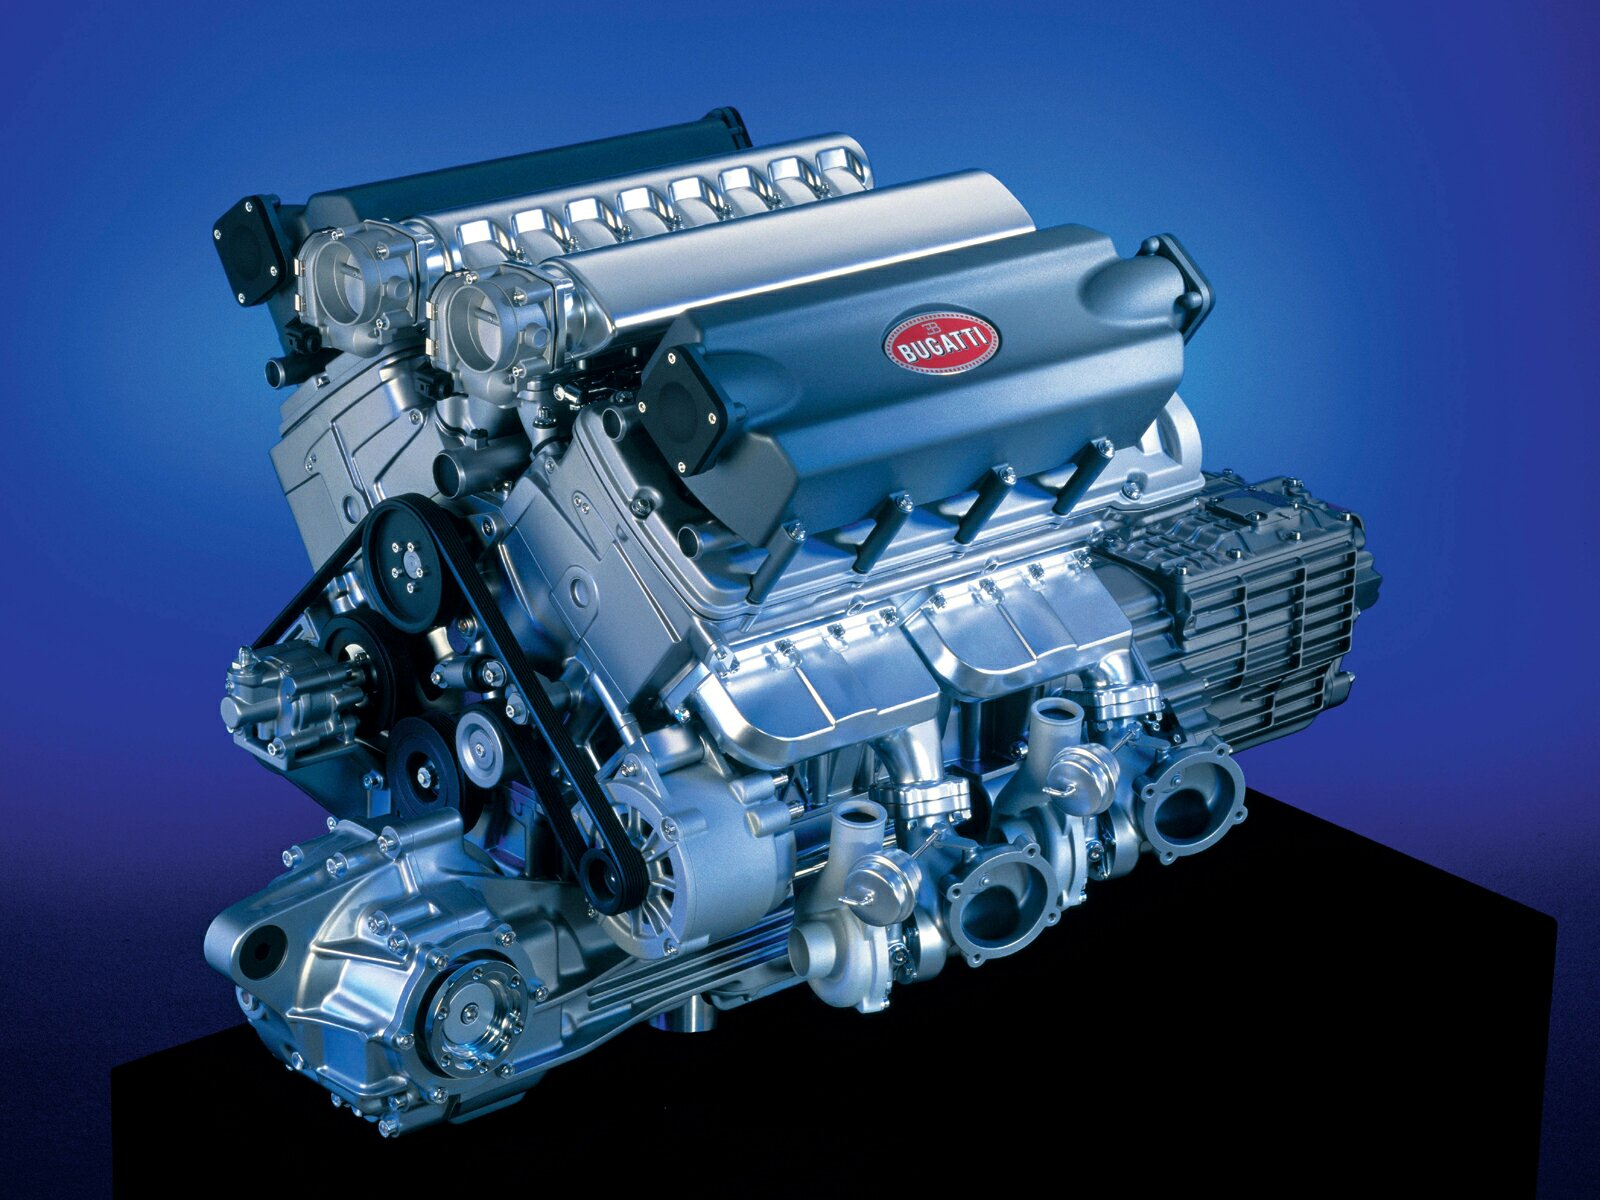 http://4.bp.blogspot.com/-ZXQbtSdbkLw/TmBIAo27HHI/AAAAAAAAAZc/jqZw5zG90-c/s1600/bugatti-engine.jpg